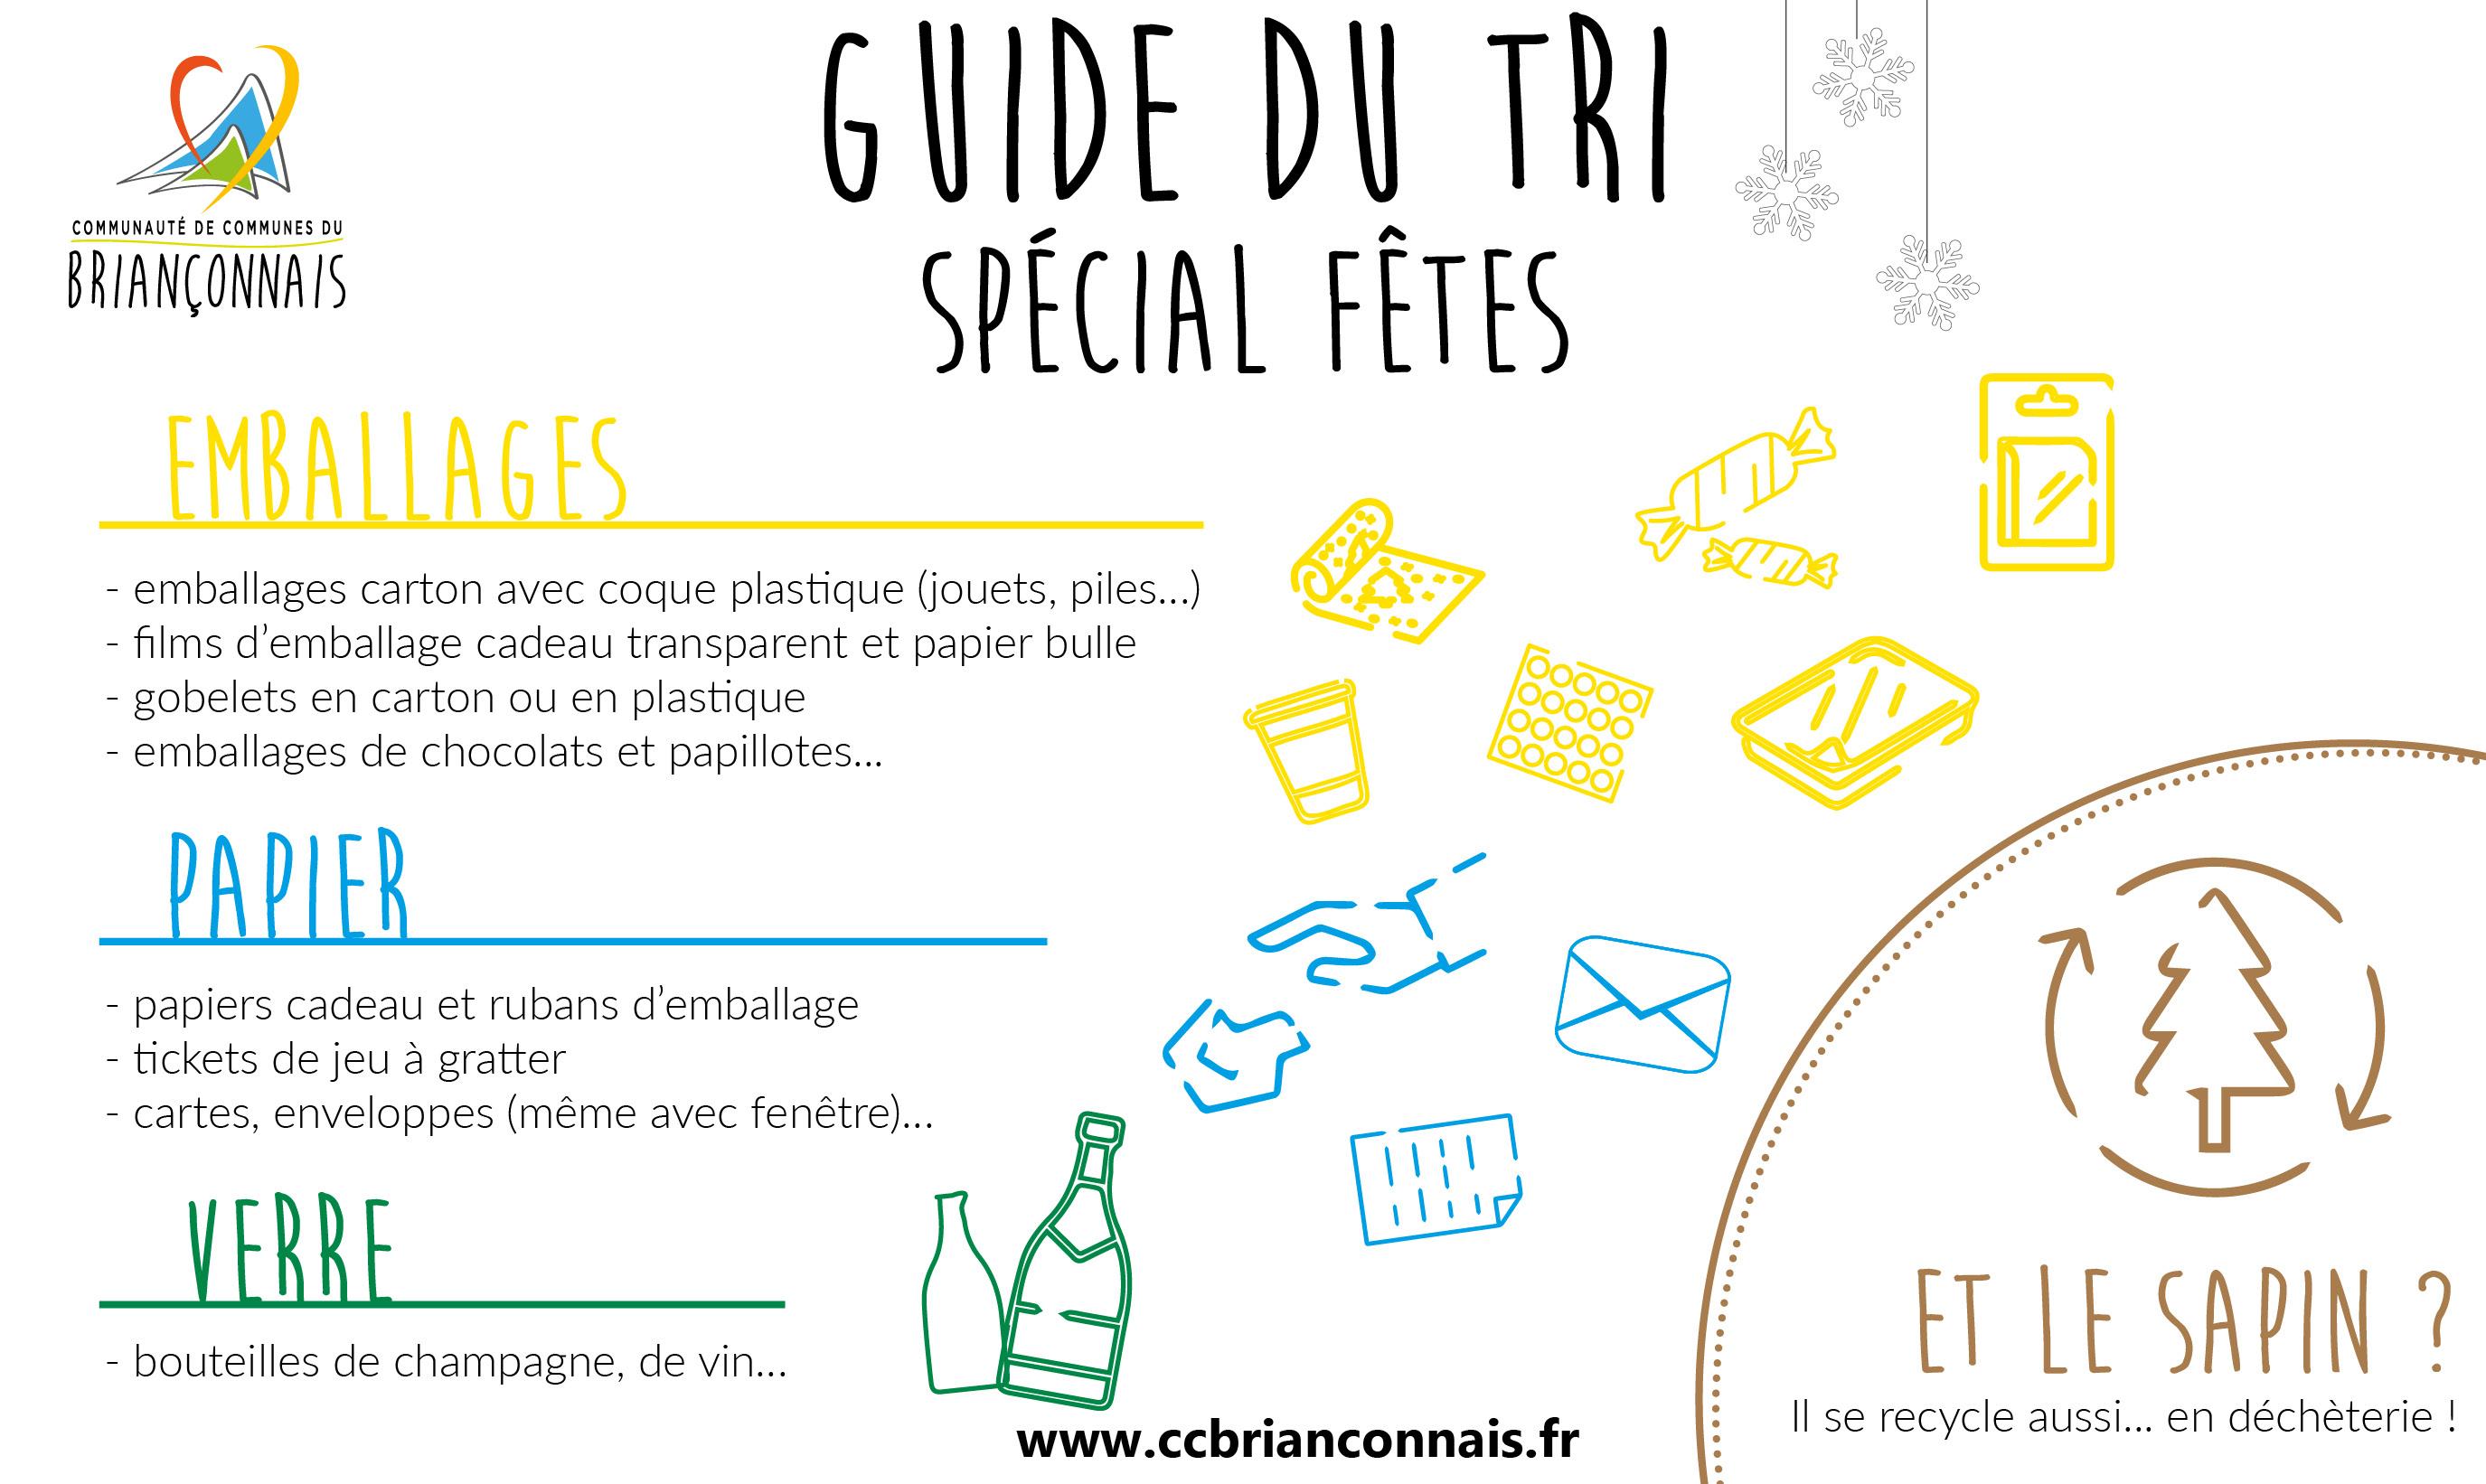 guide_du_tri_special_fetes.jpg